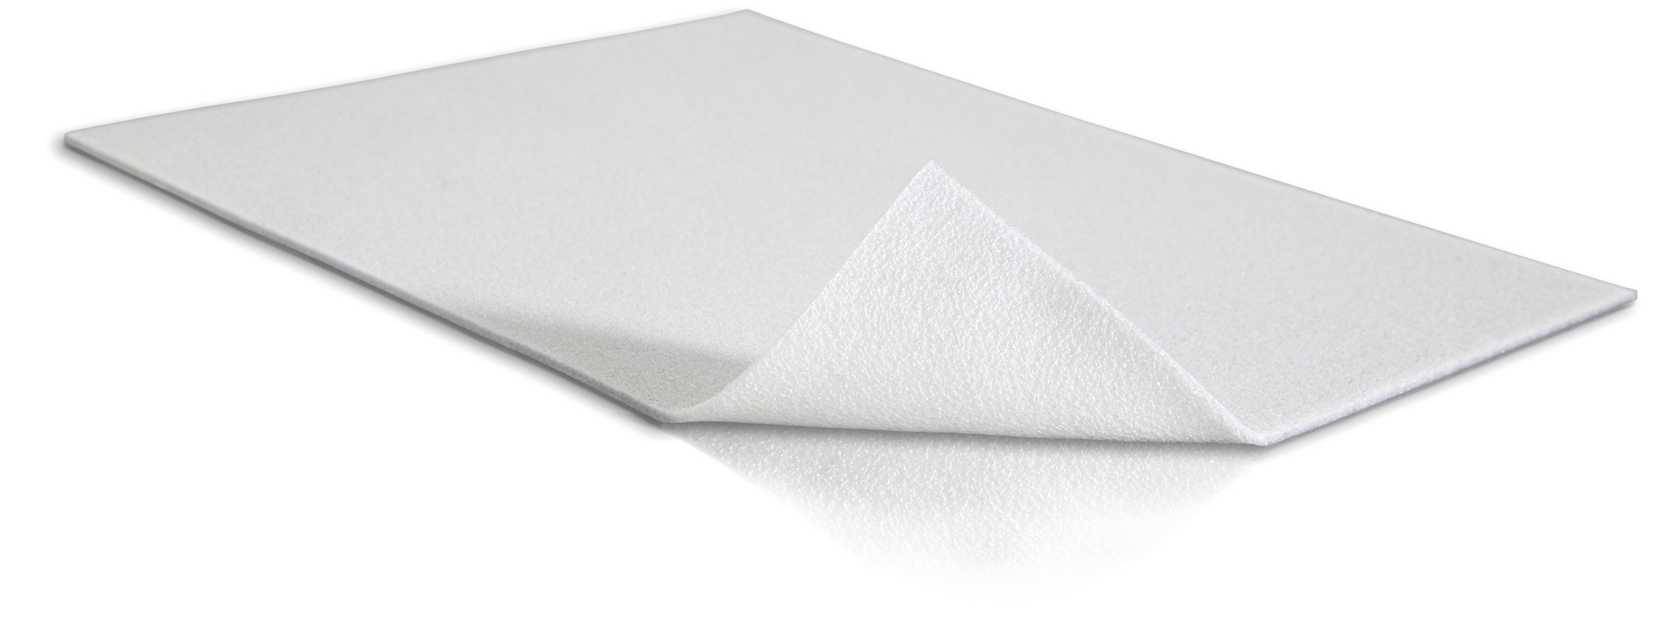 Bandasje skum Mepilex Transfer 20x50cm